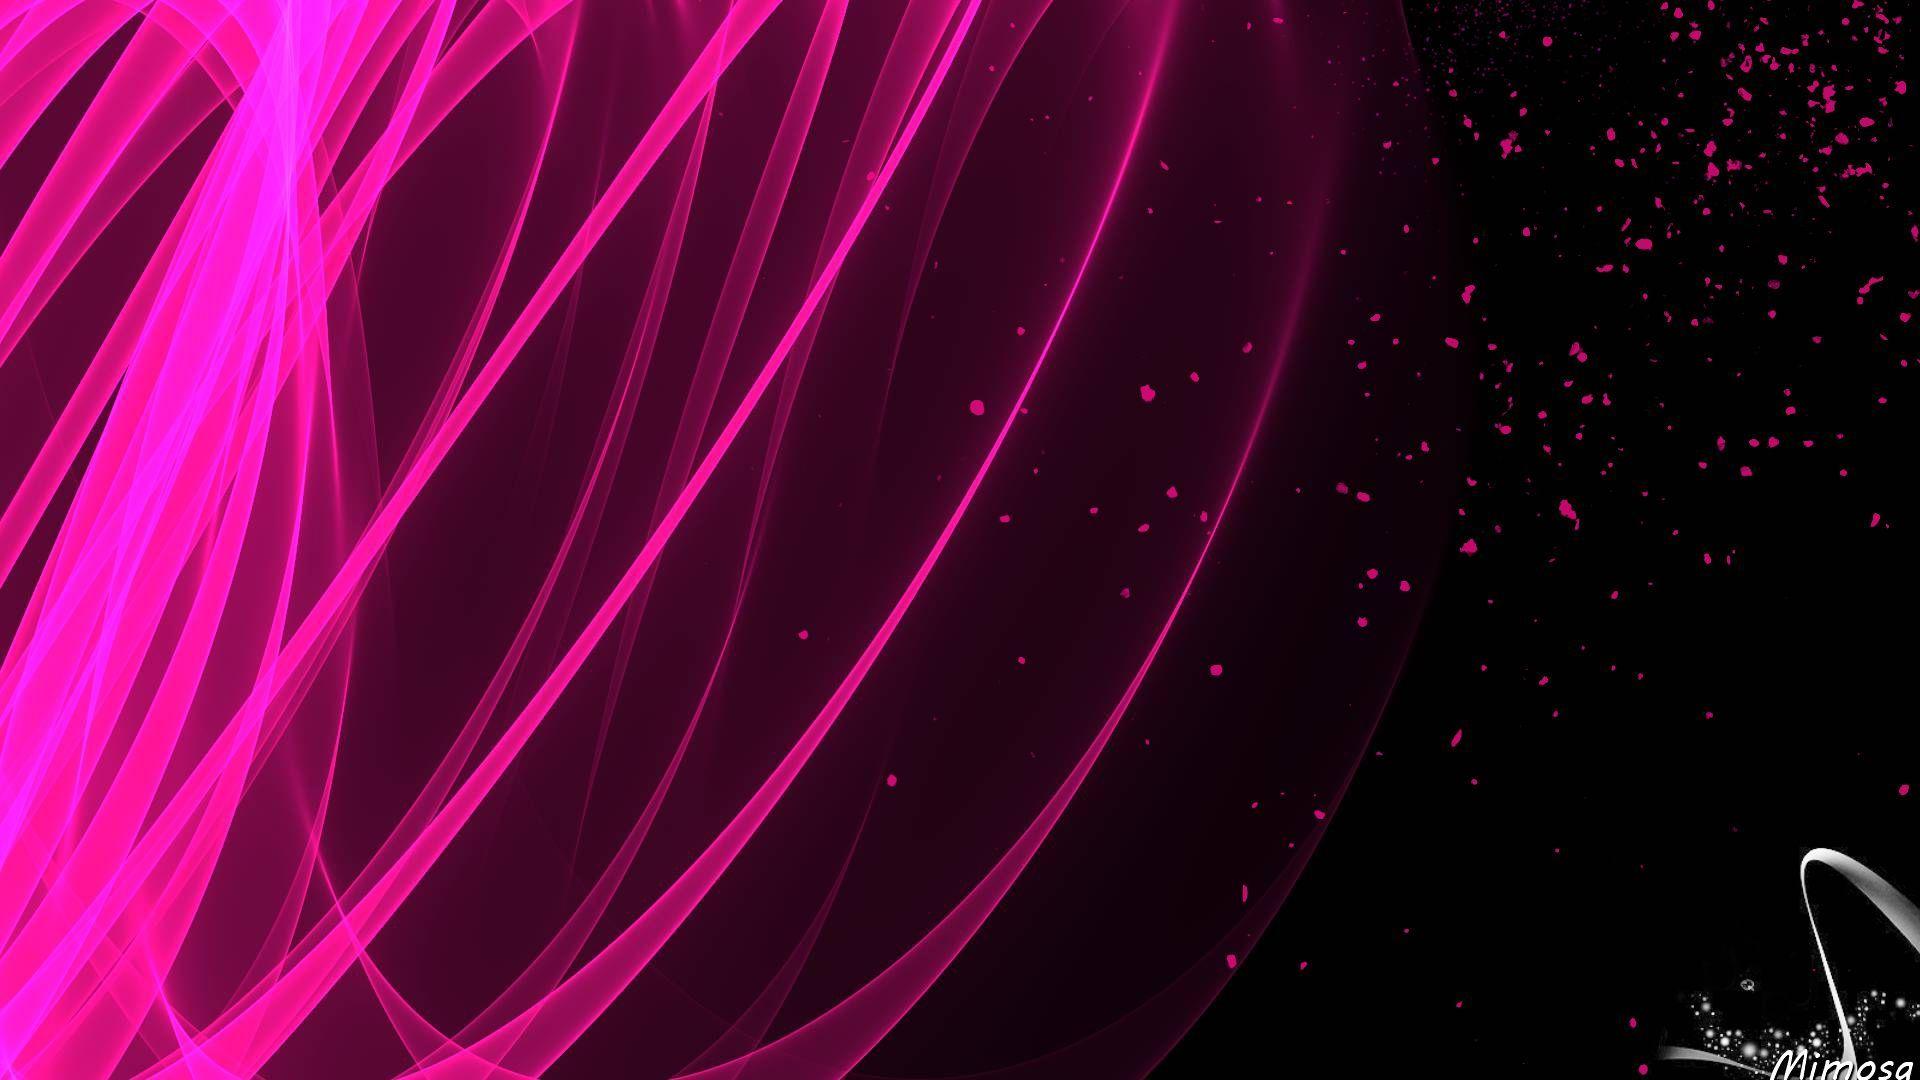 Fuschia Full HD Wallpaper